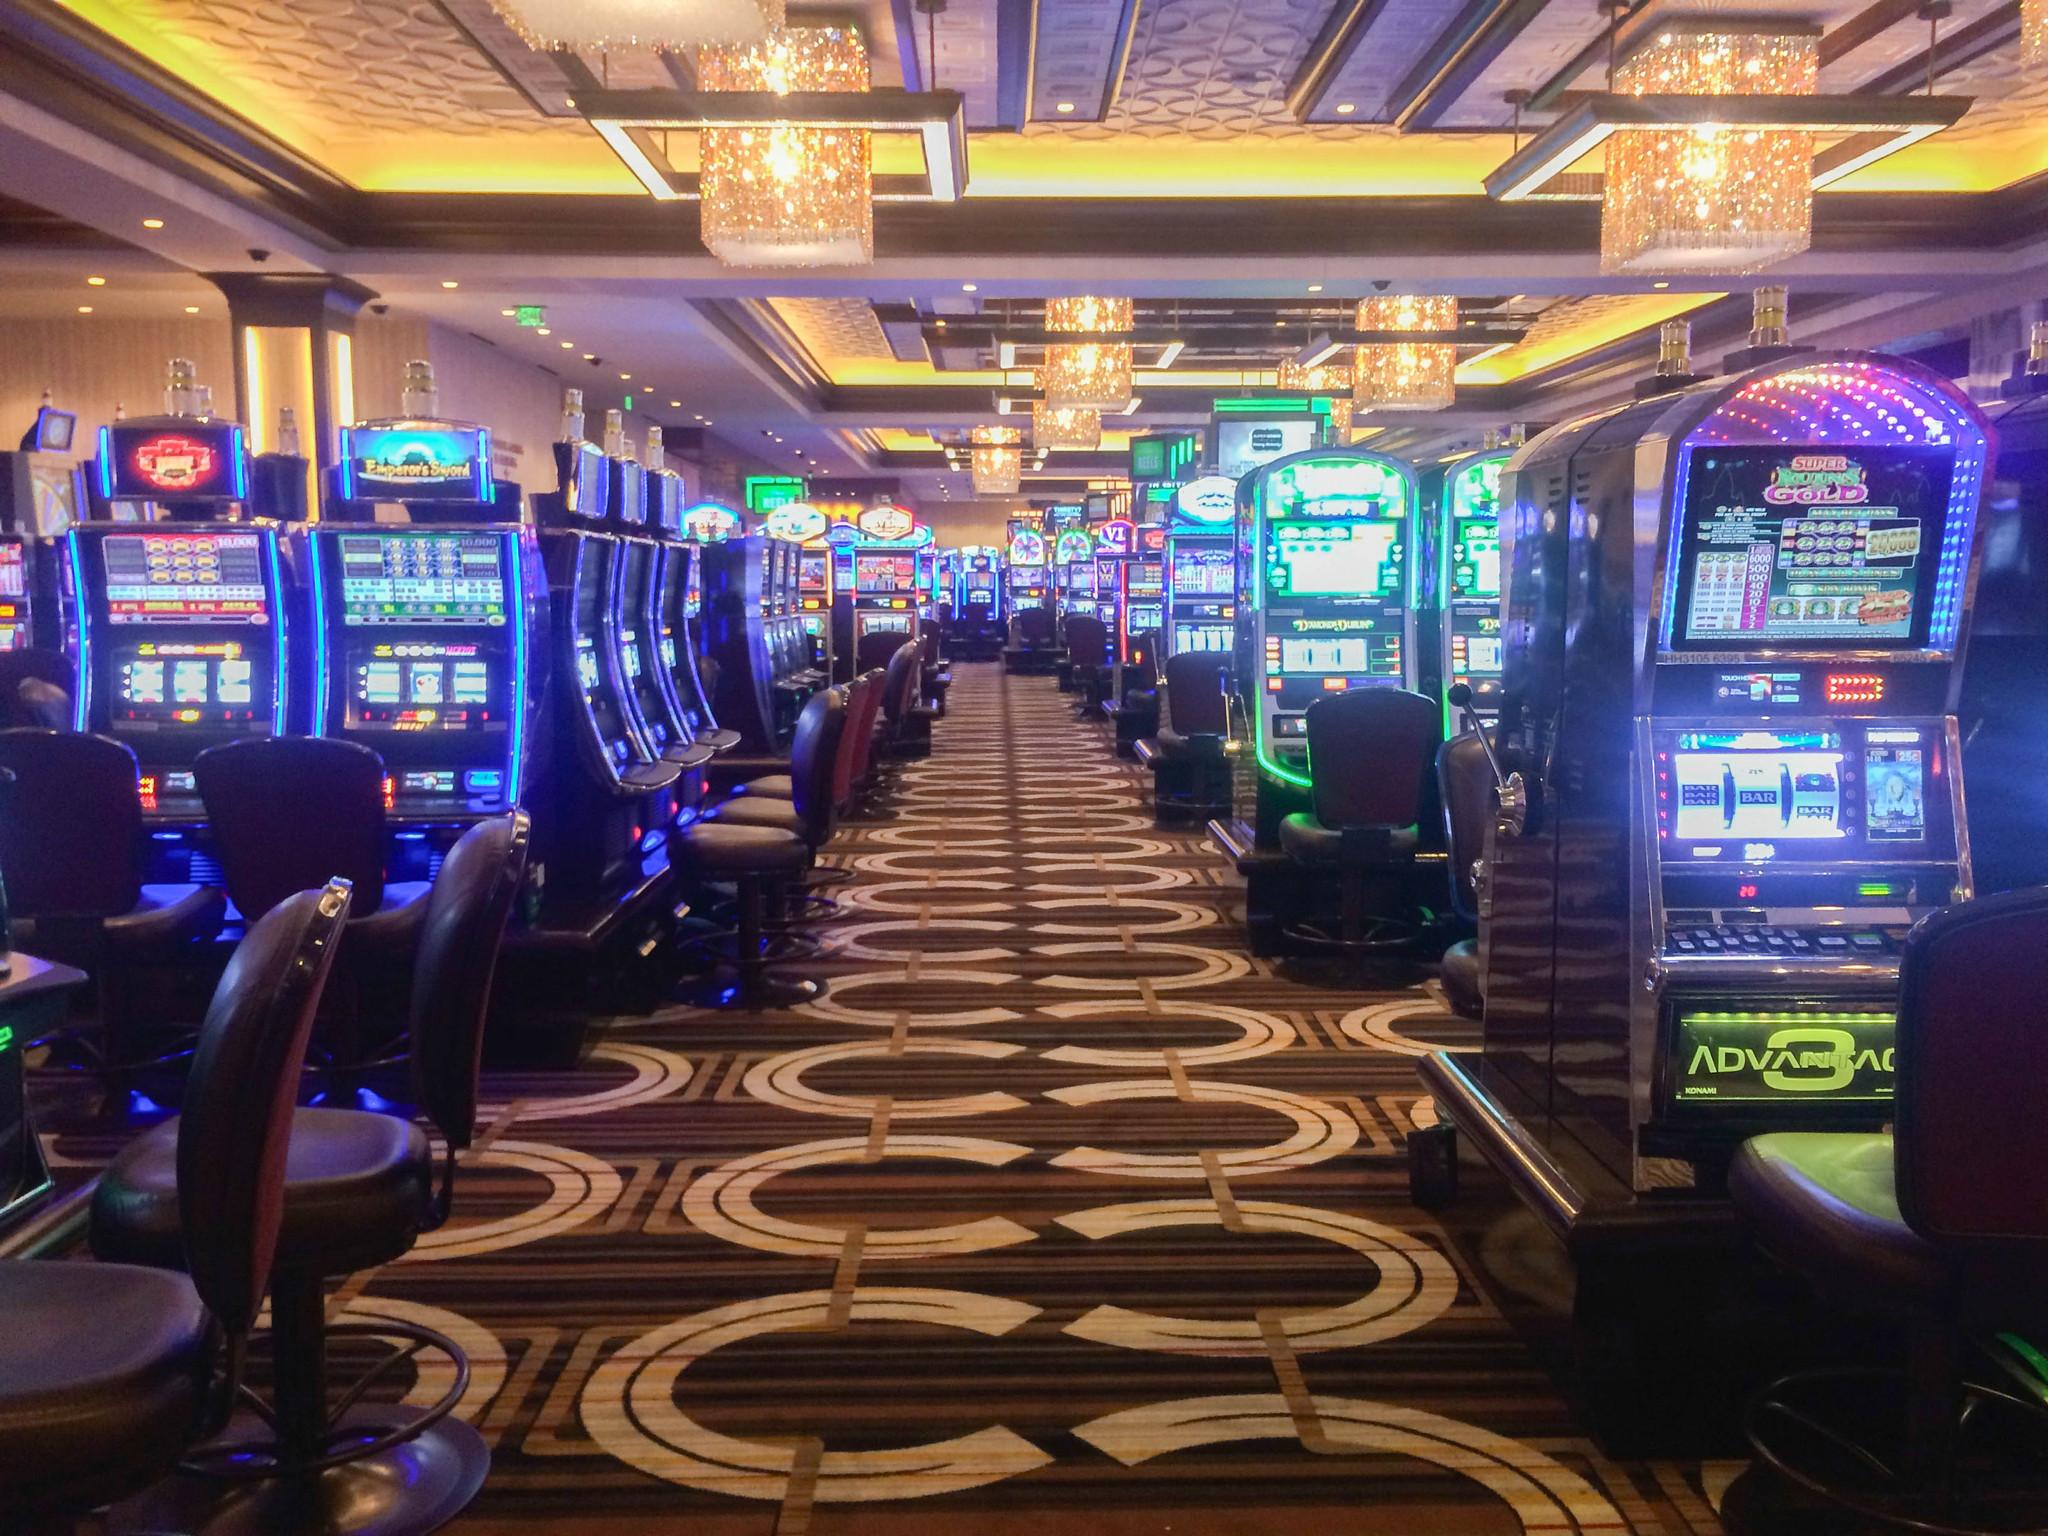 24hr casino gambling junkets from charleston sc